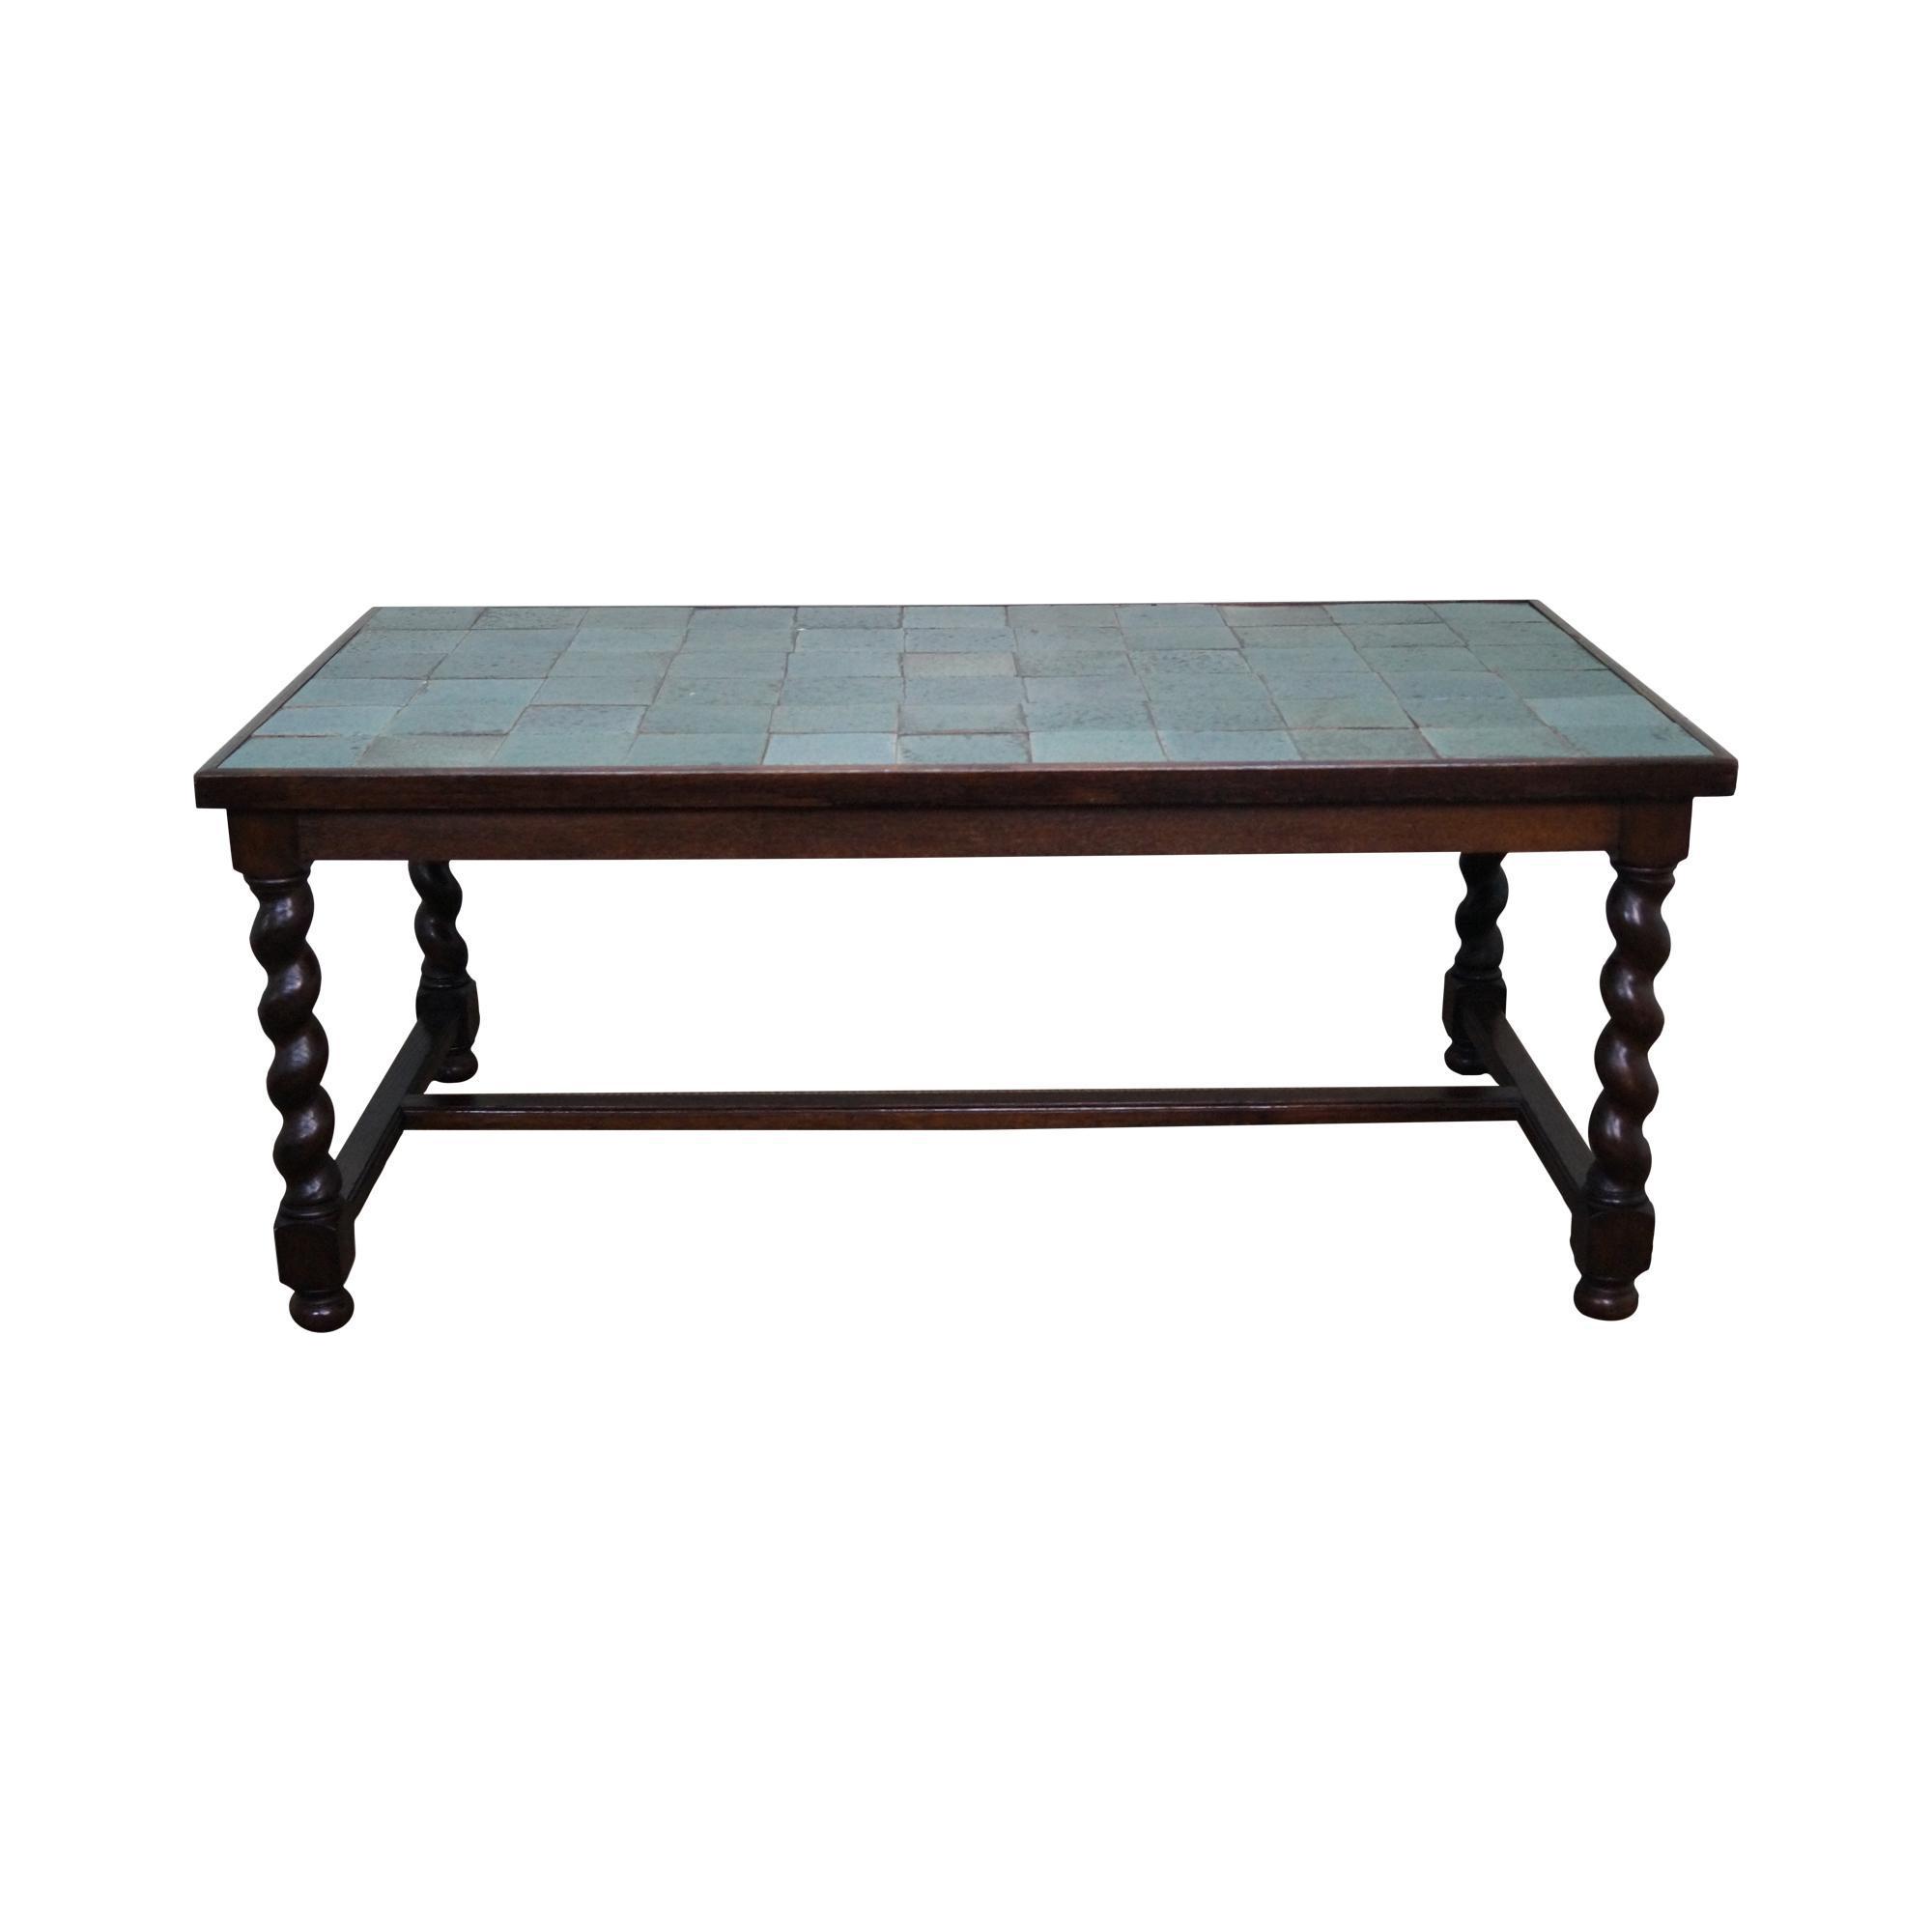 Antique Arts & Crafts Oak Barley Twist Green Tile Top Dining Table